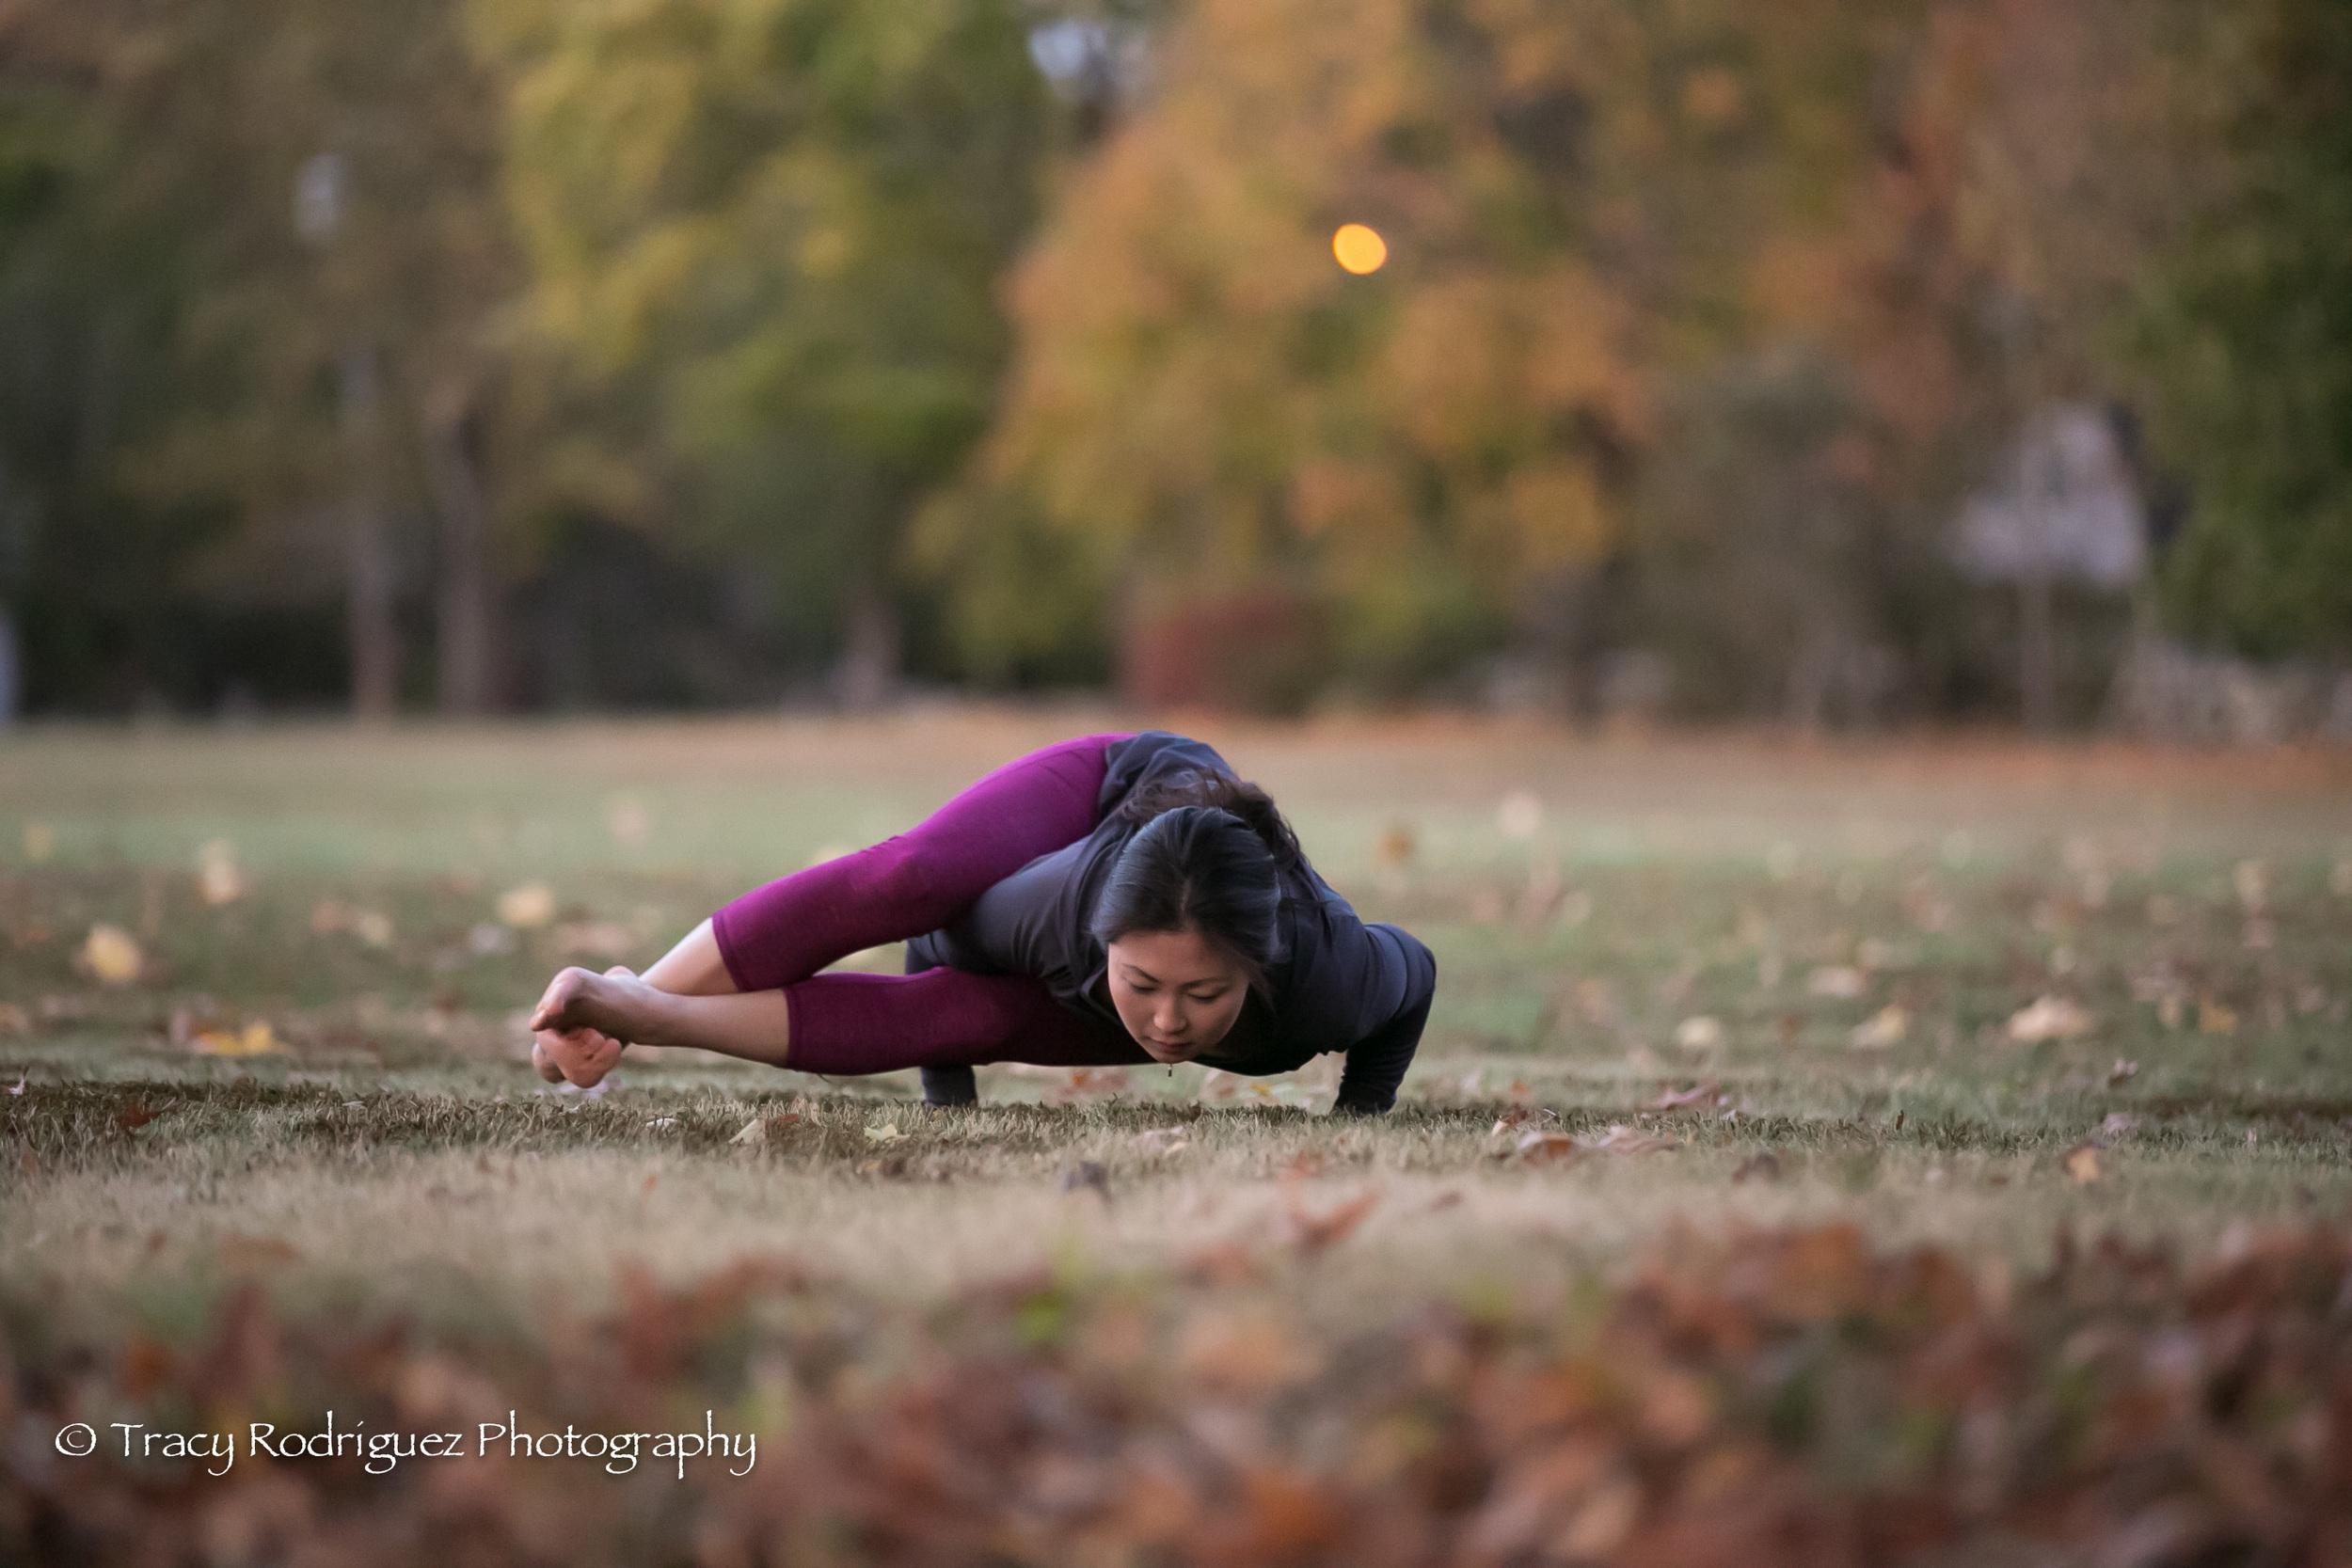 Tracy_Rodriguez_Photography_Blog-5446.jpg